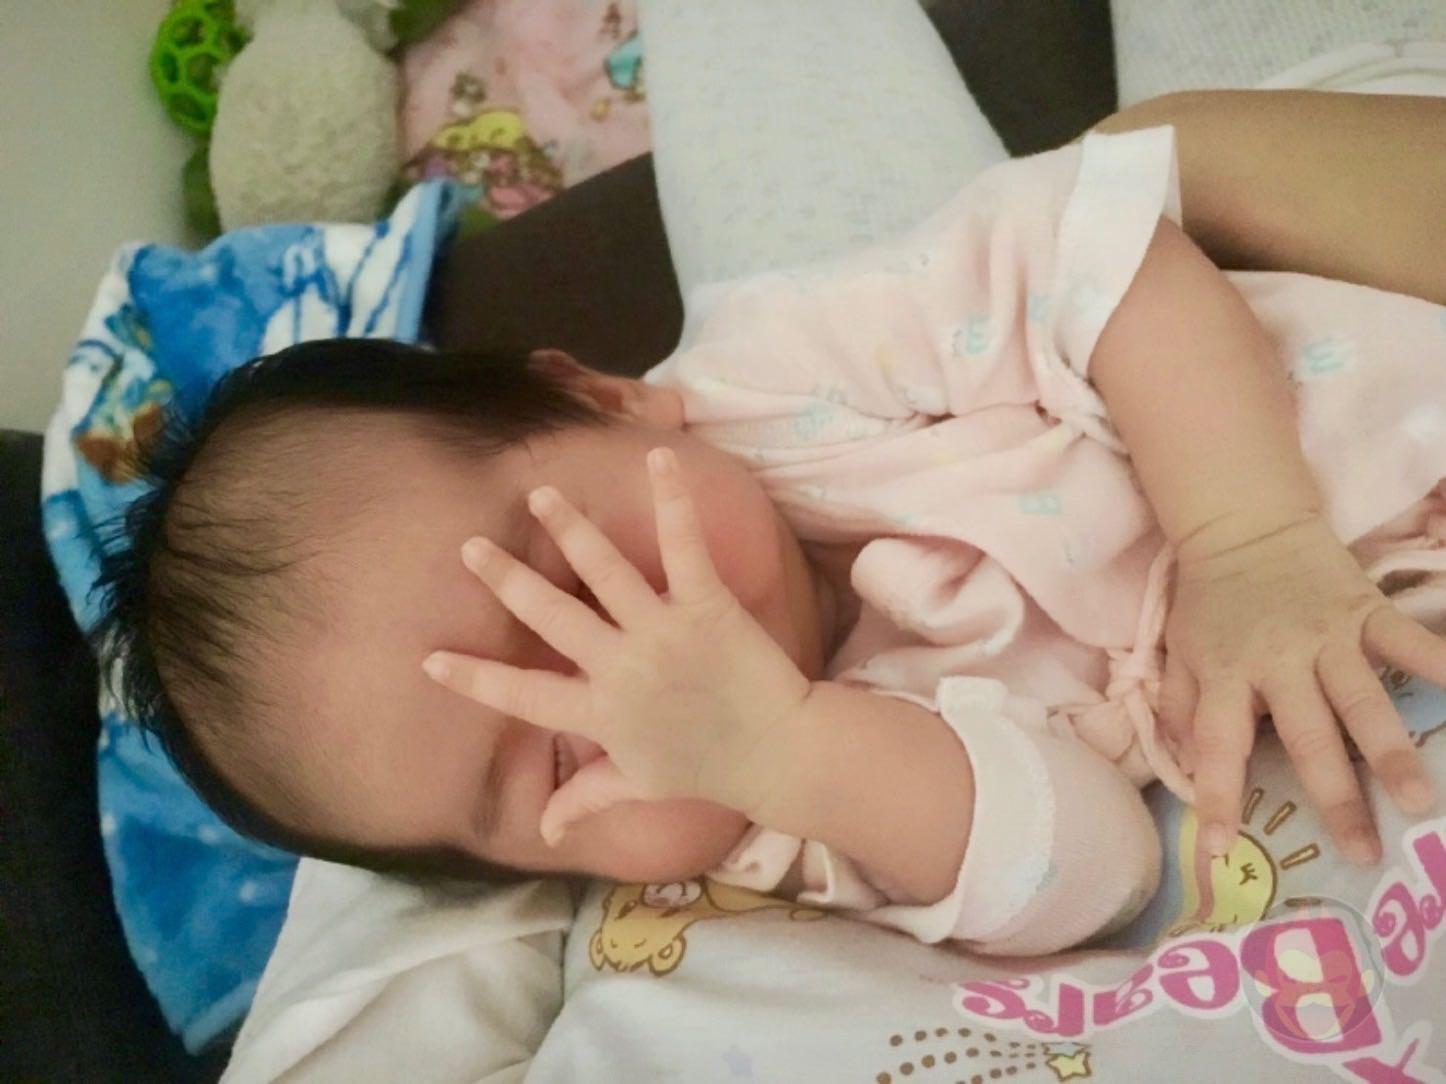 Papa-Me-How-to-make-my-daughter-sleep-01.jpg